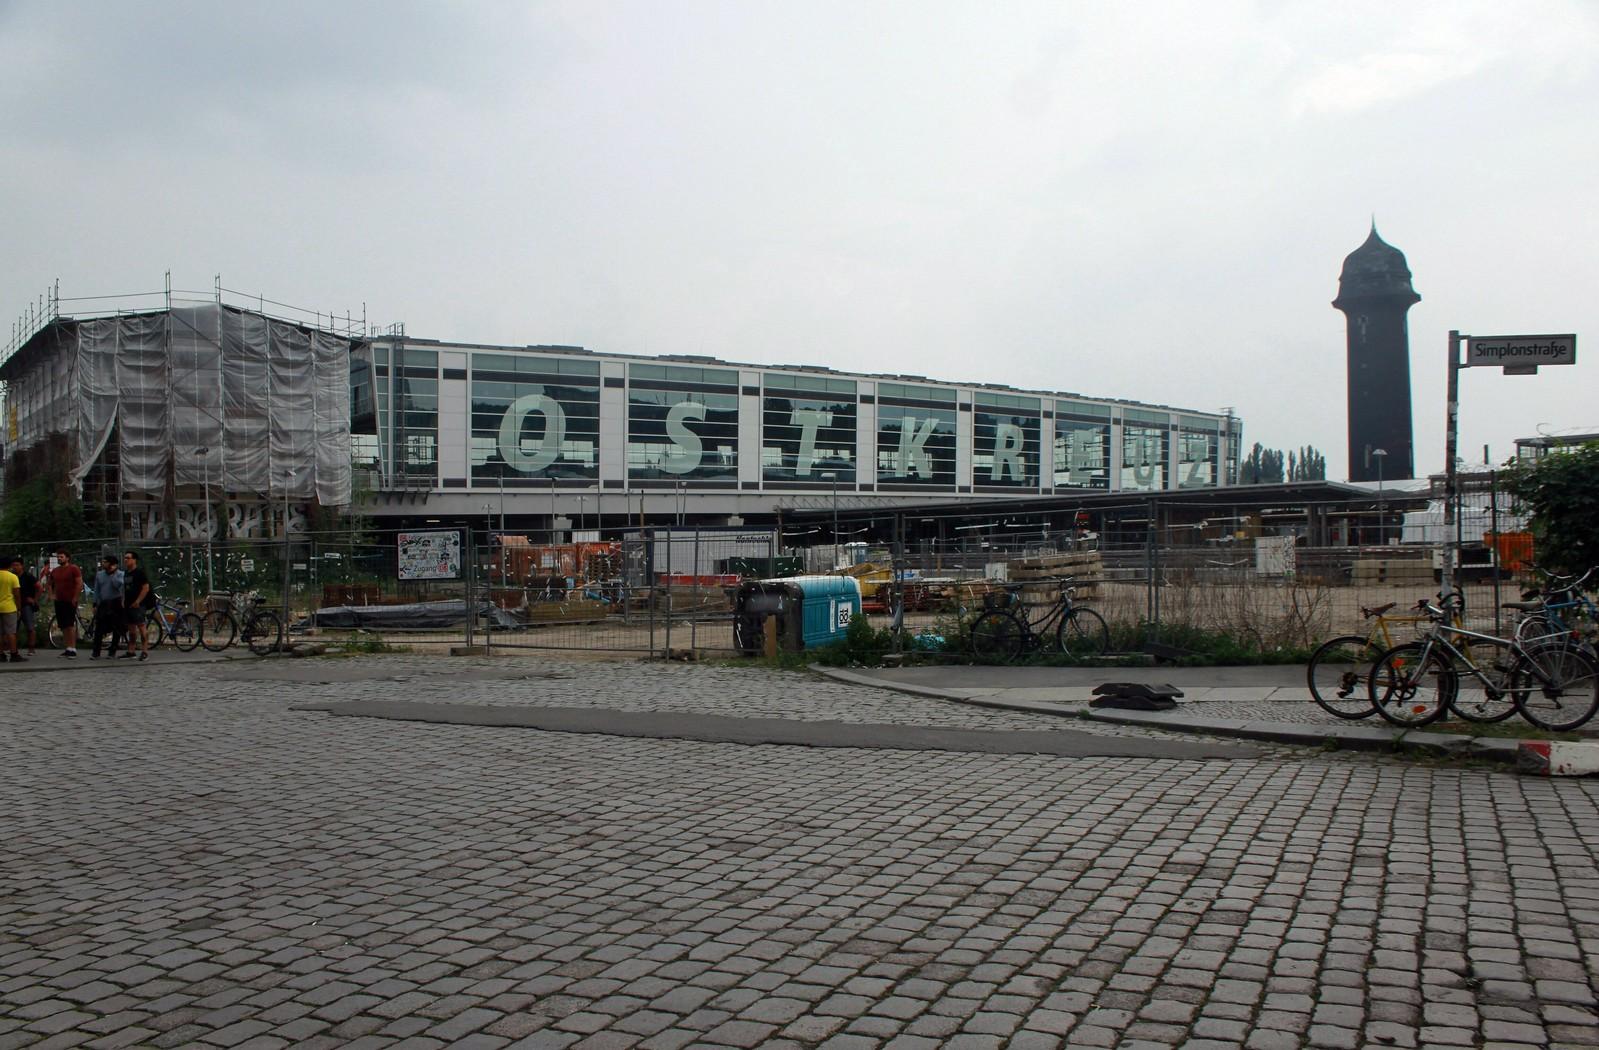 Ostkreuz: Die Ringbahnhalle am Ostkreuz